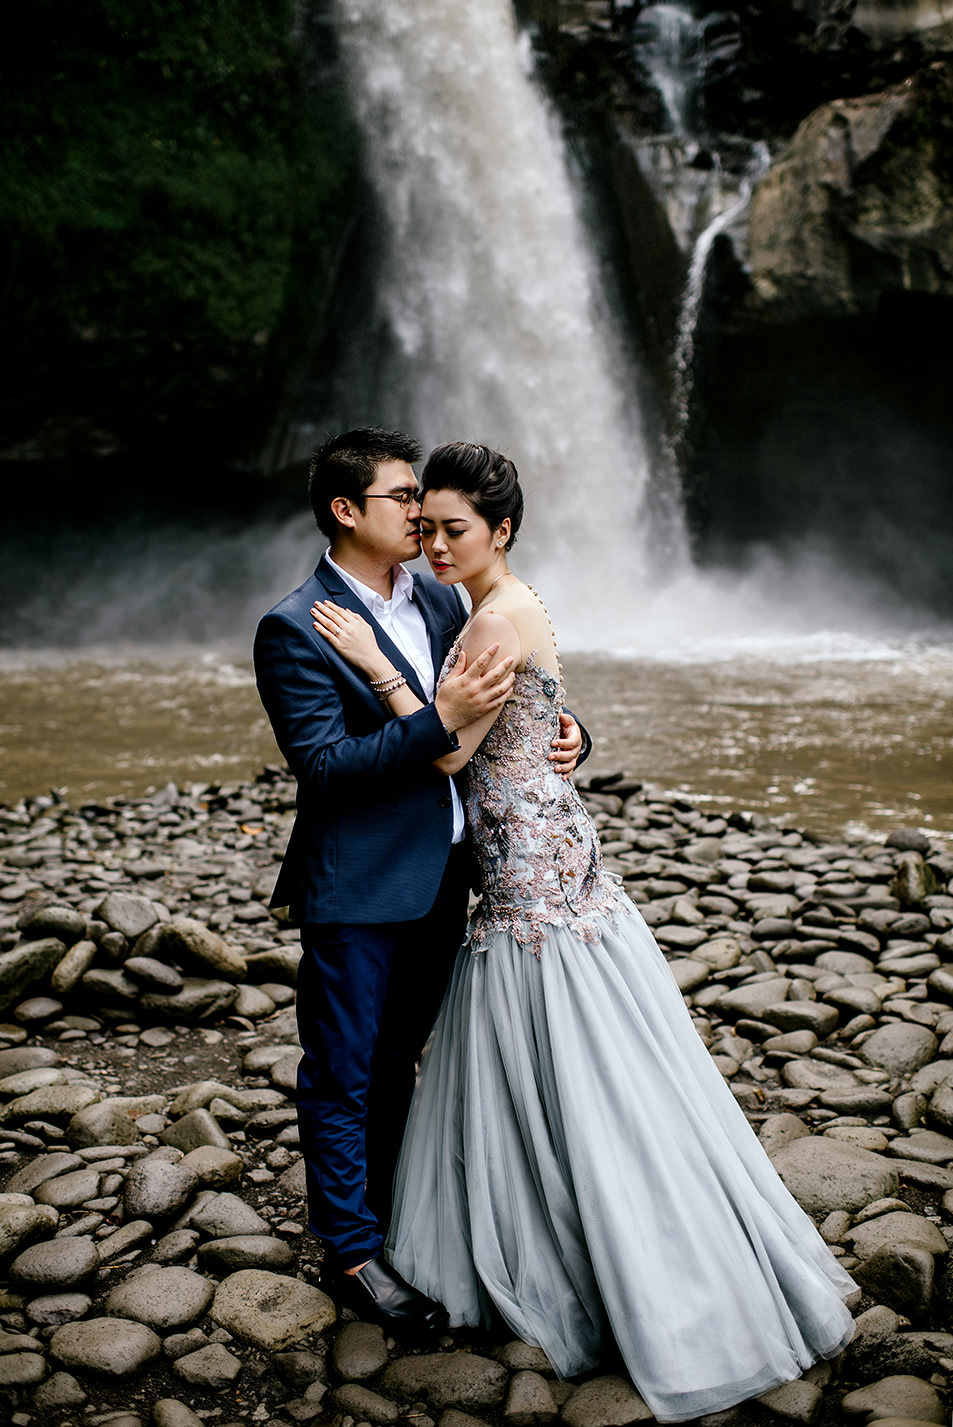 Bali-waterfall-engagment-Bali-wedding-photographer19.jpg